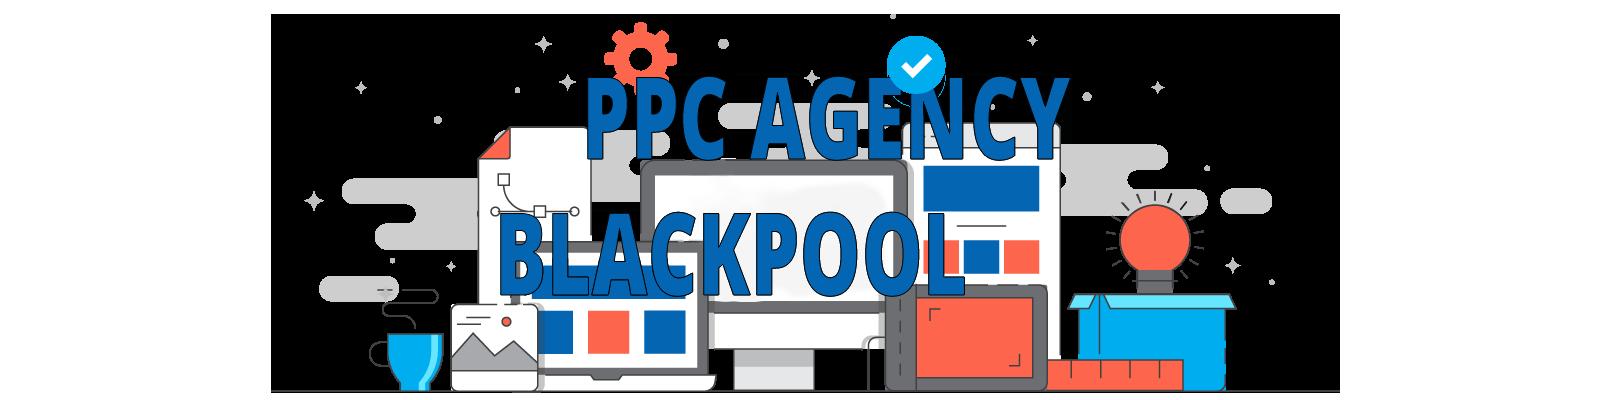 seek social ppc agency blackpool transparent header